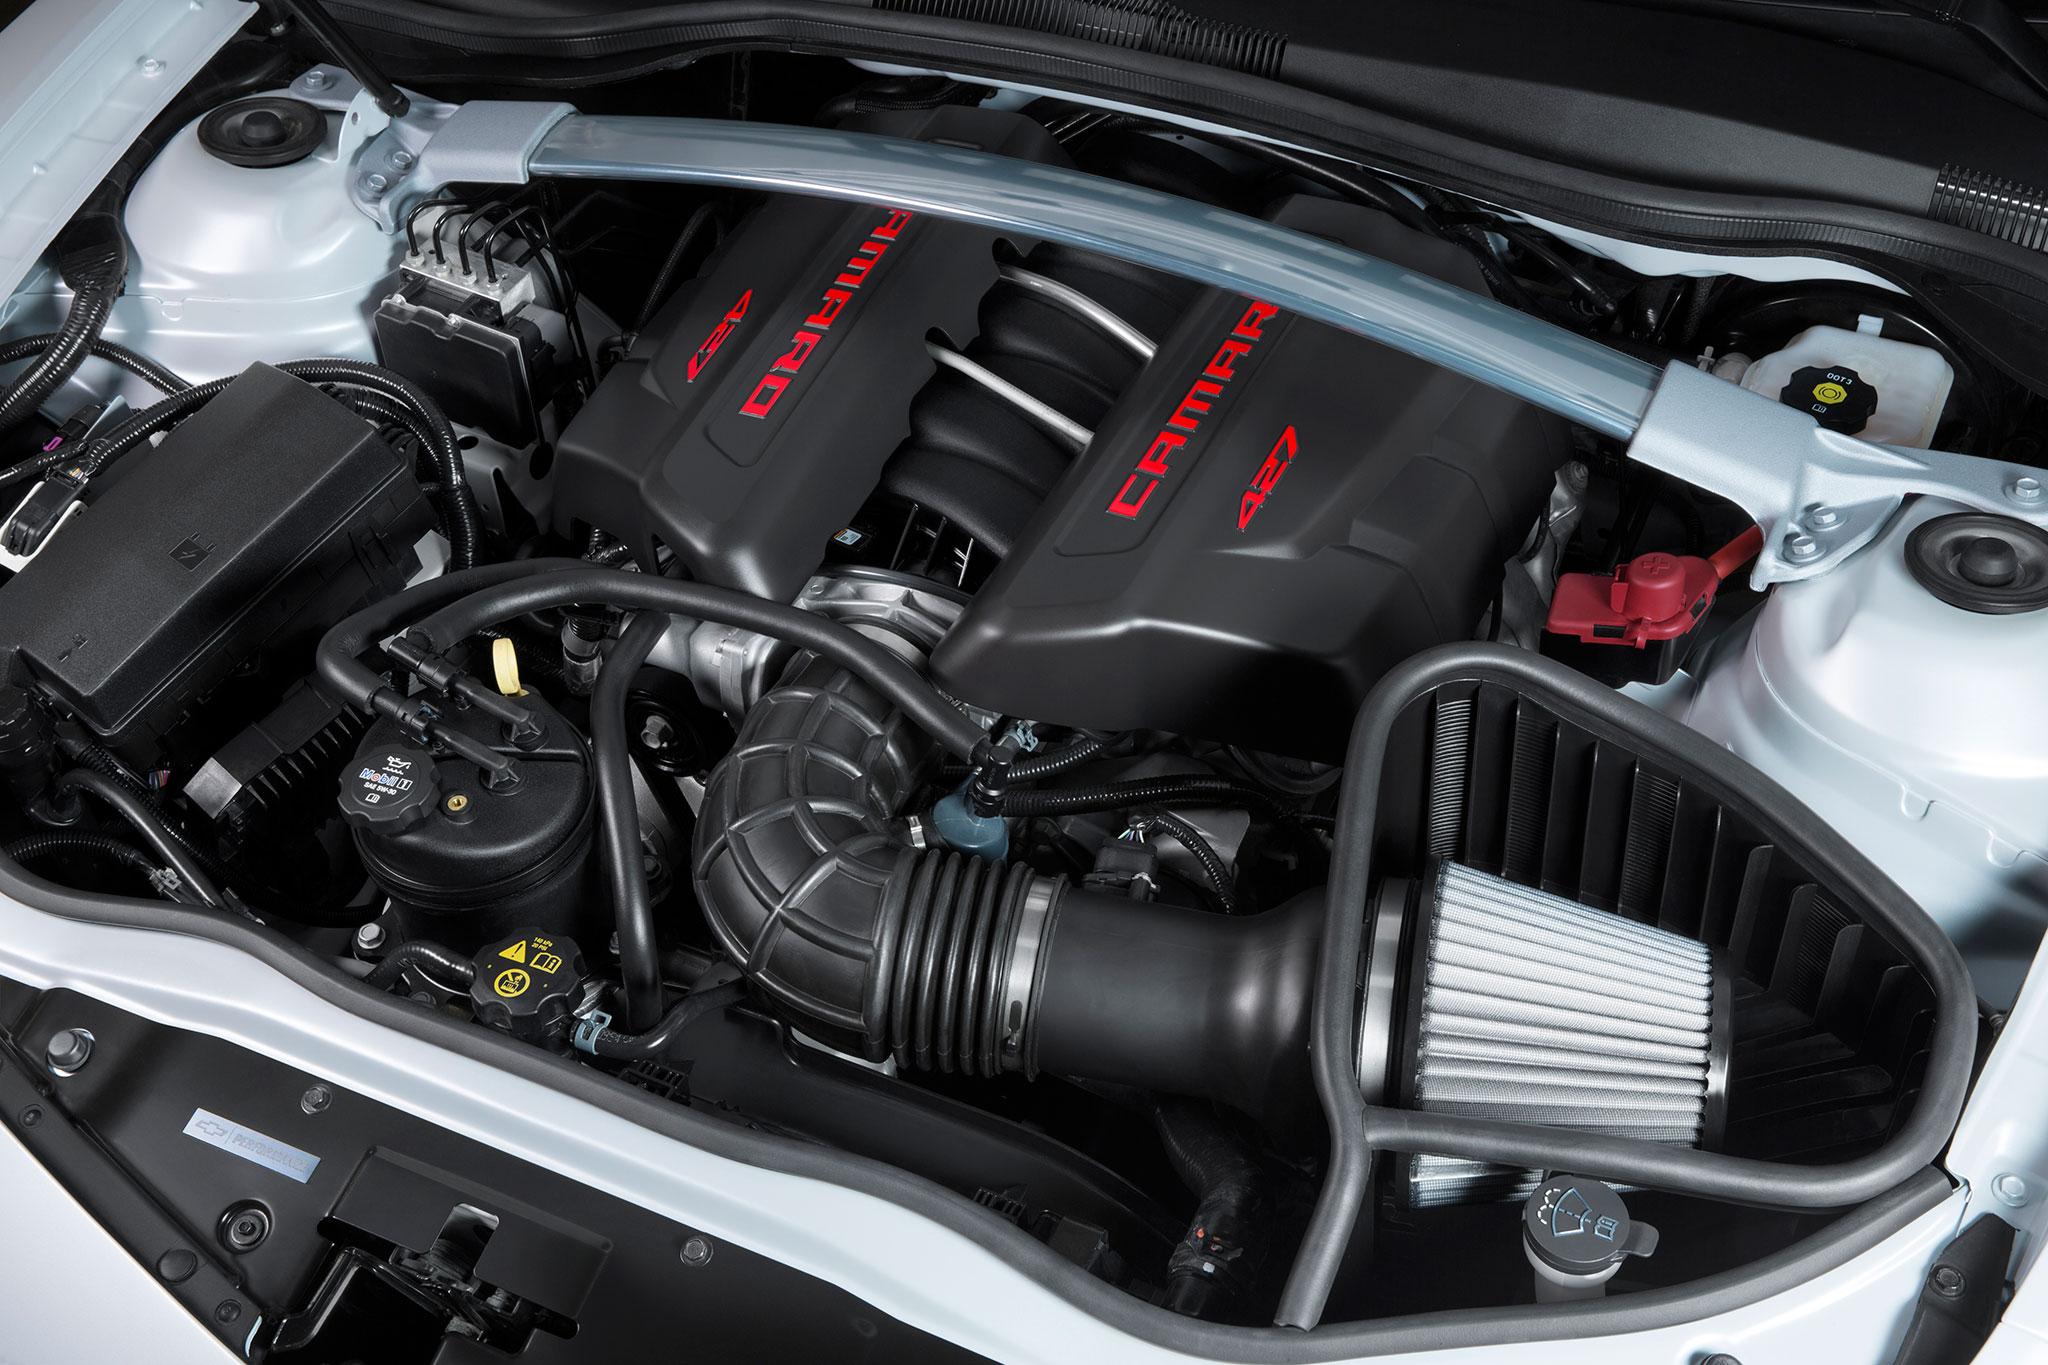 2014 Chevrolet Camaro Z 28 Review Automobile Magazine Geo Metro Lsi Engine Diagrams Z28